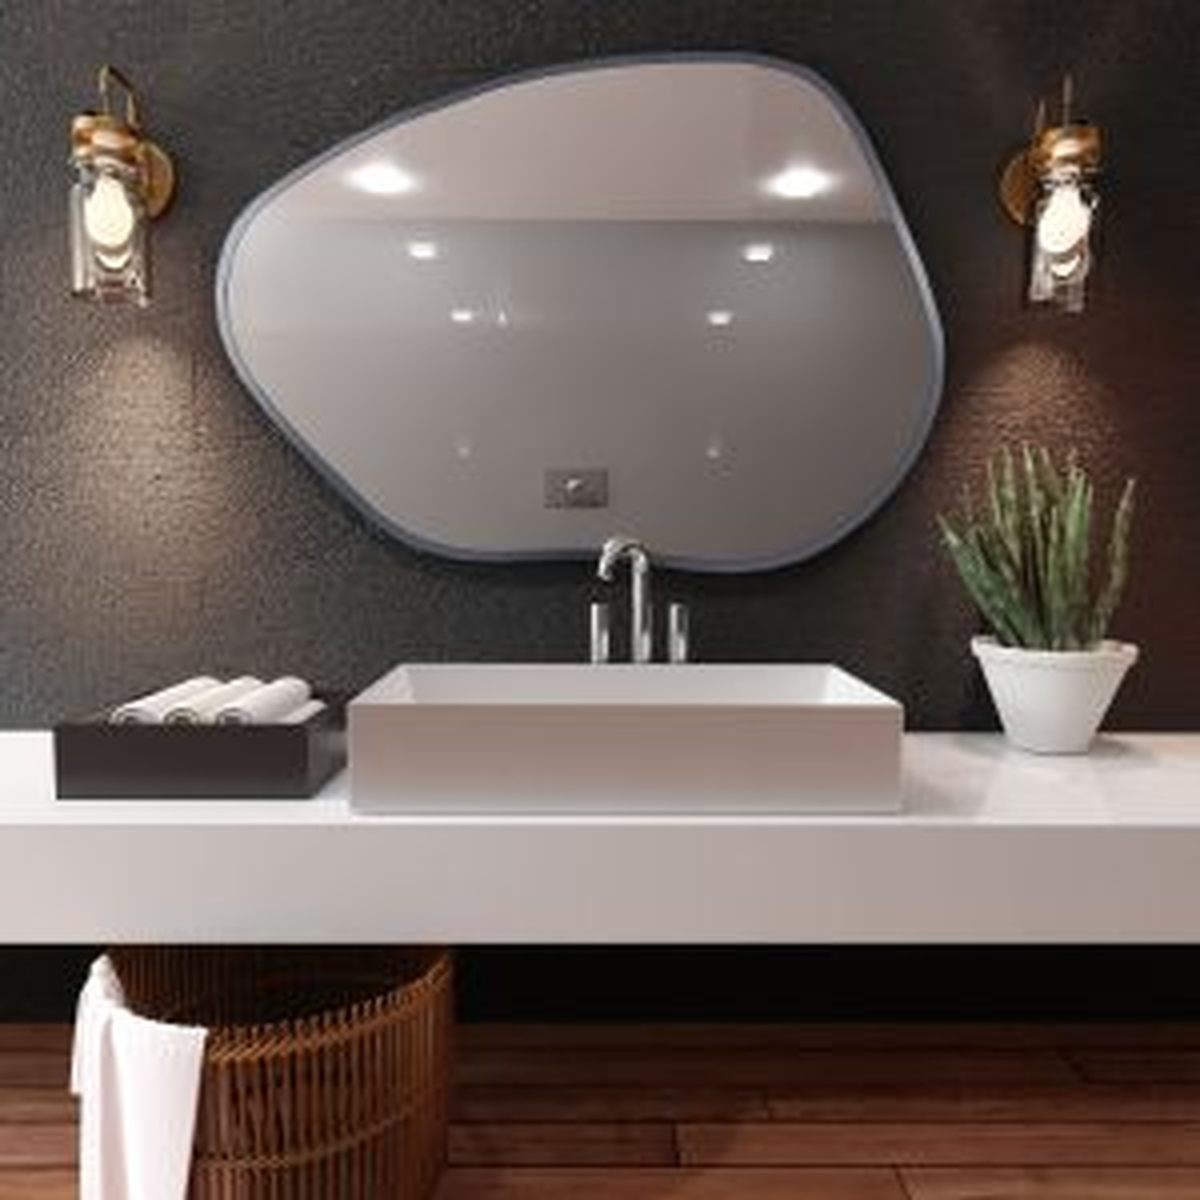 Lustro łazienkowe RUBINO CLOUD I 70